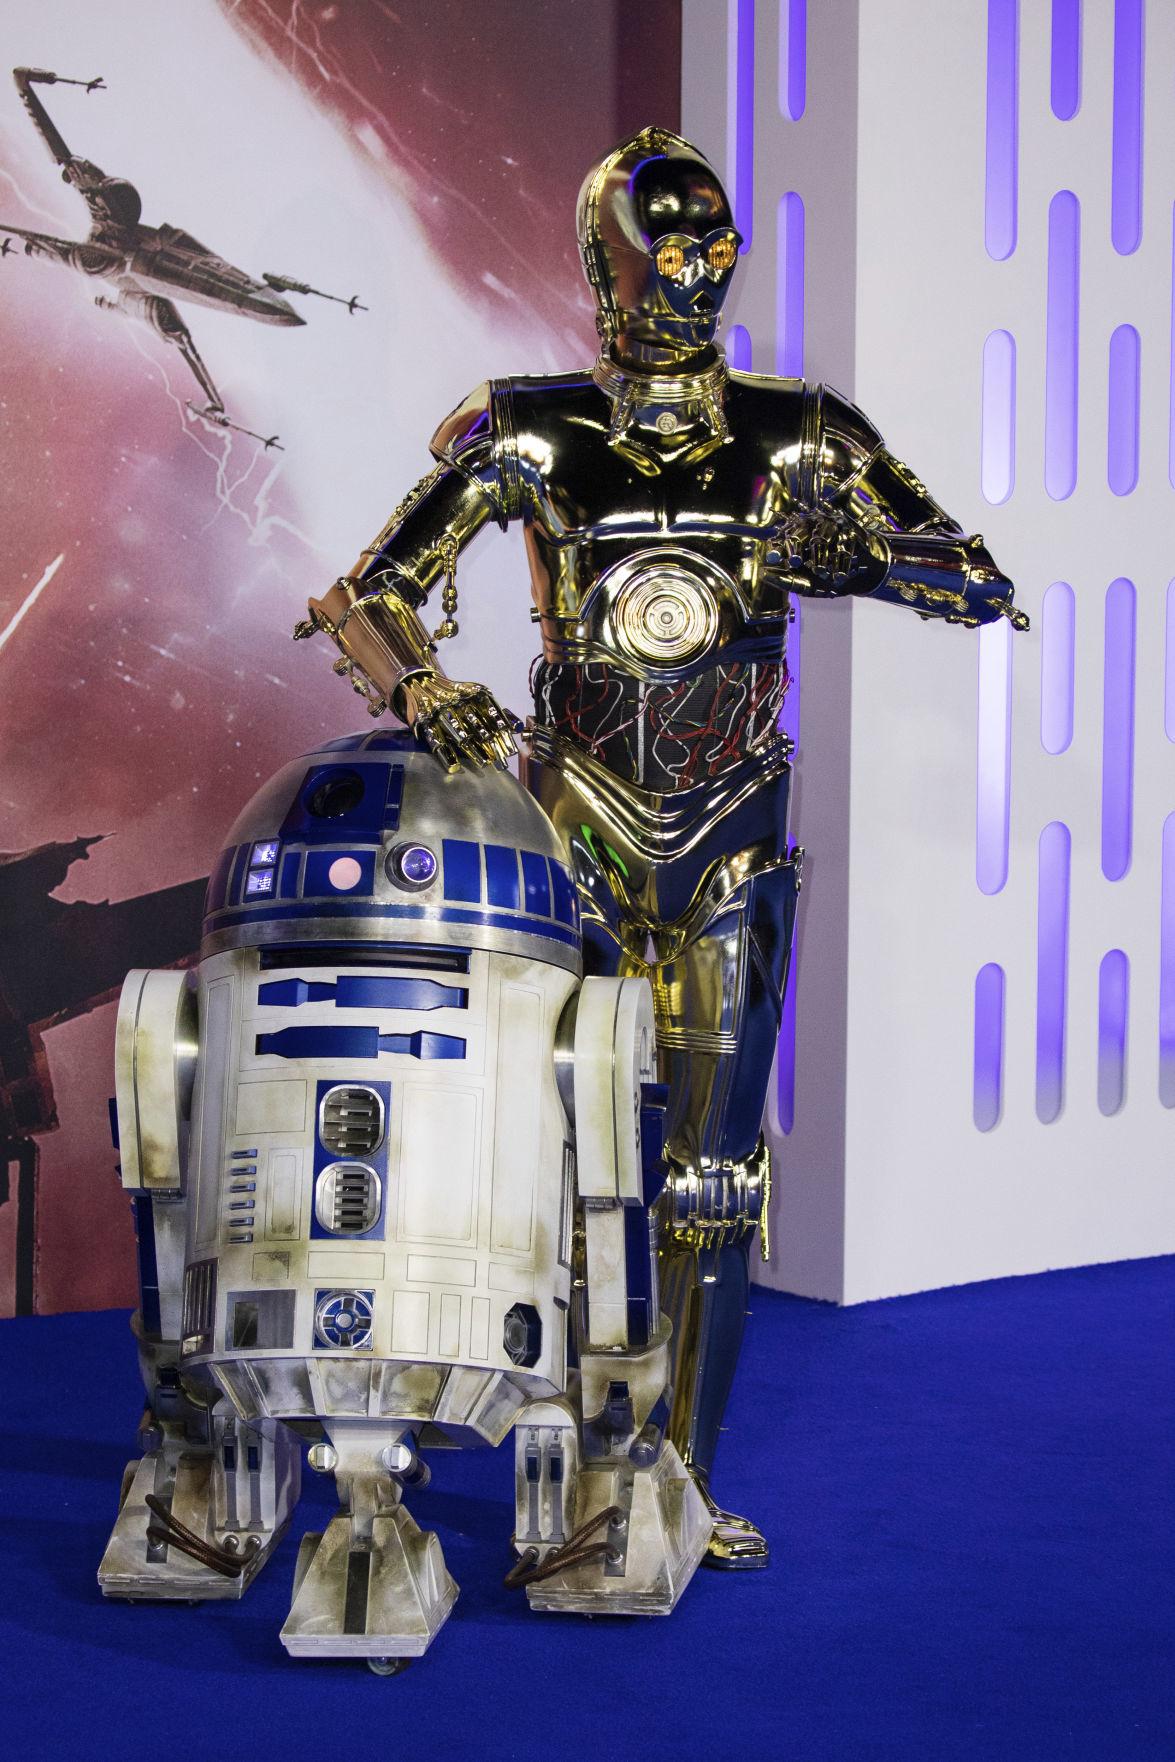 Britain Star Wars: The Rise of Skywalker Premiere